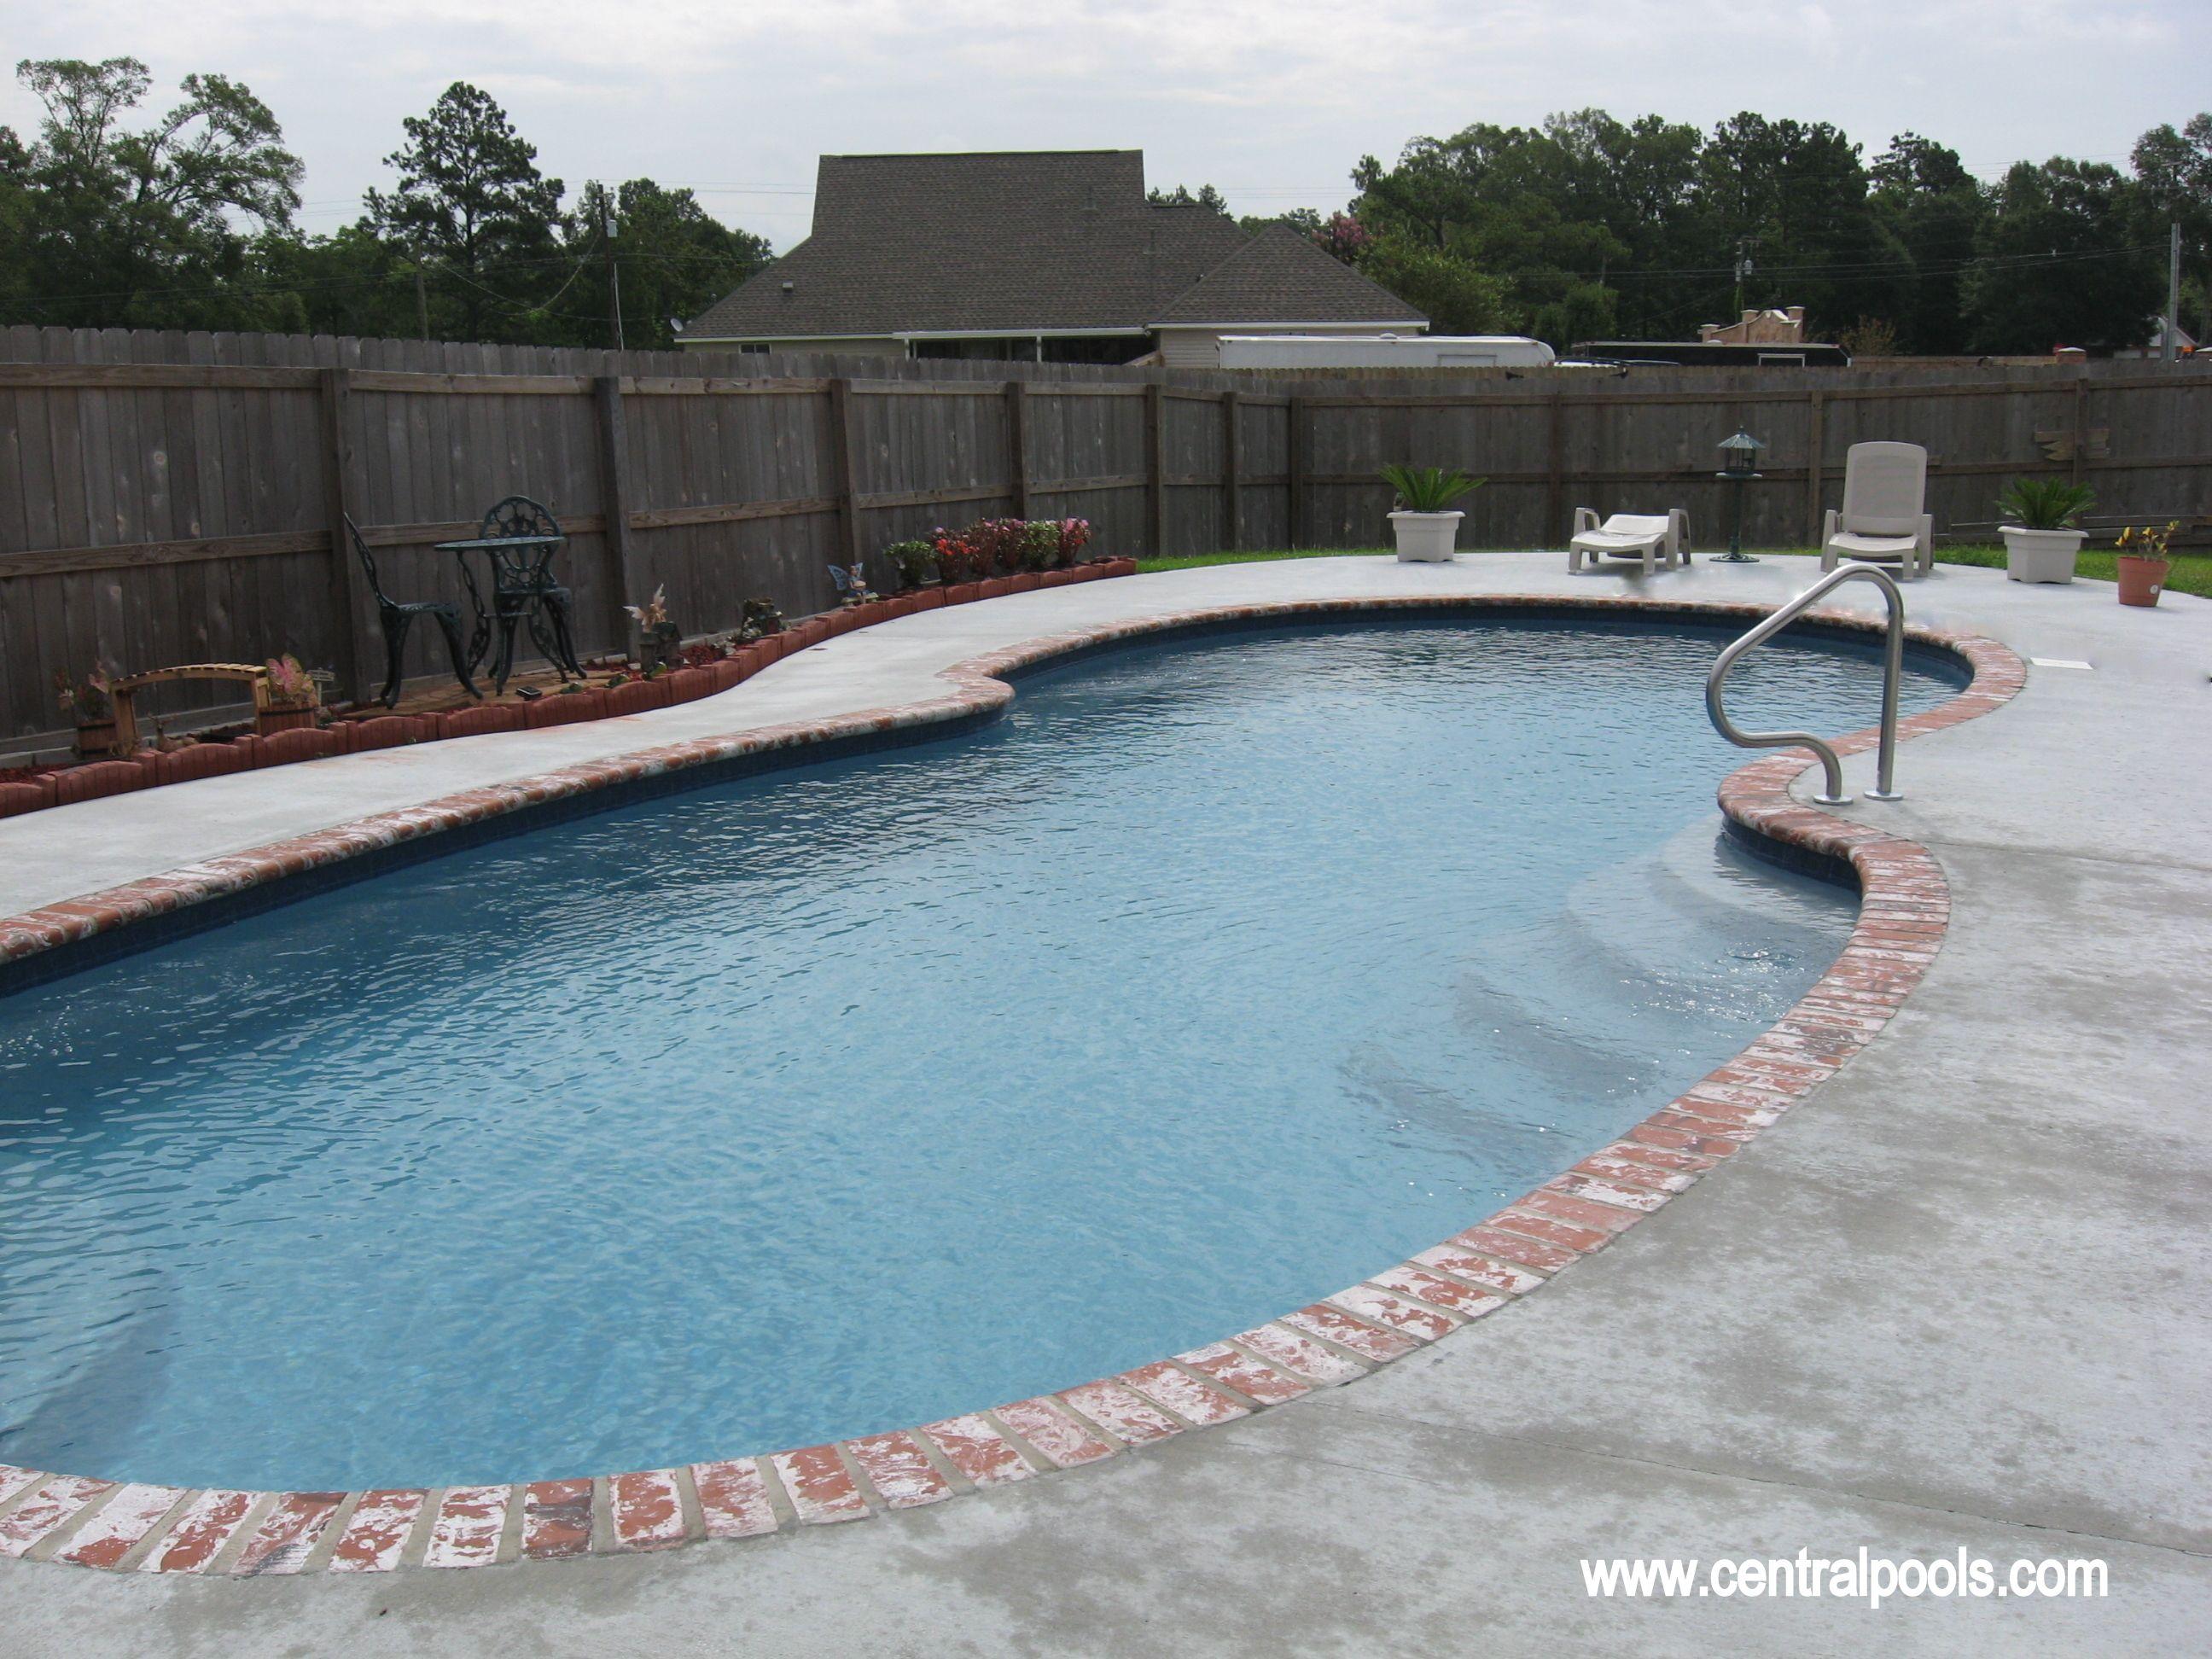 Central Pools Inc Fiberglass Swimming Pool Centralpools Com Fiberglass Pools Pool Swimming Pools